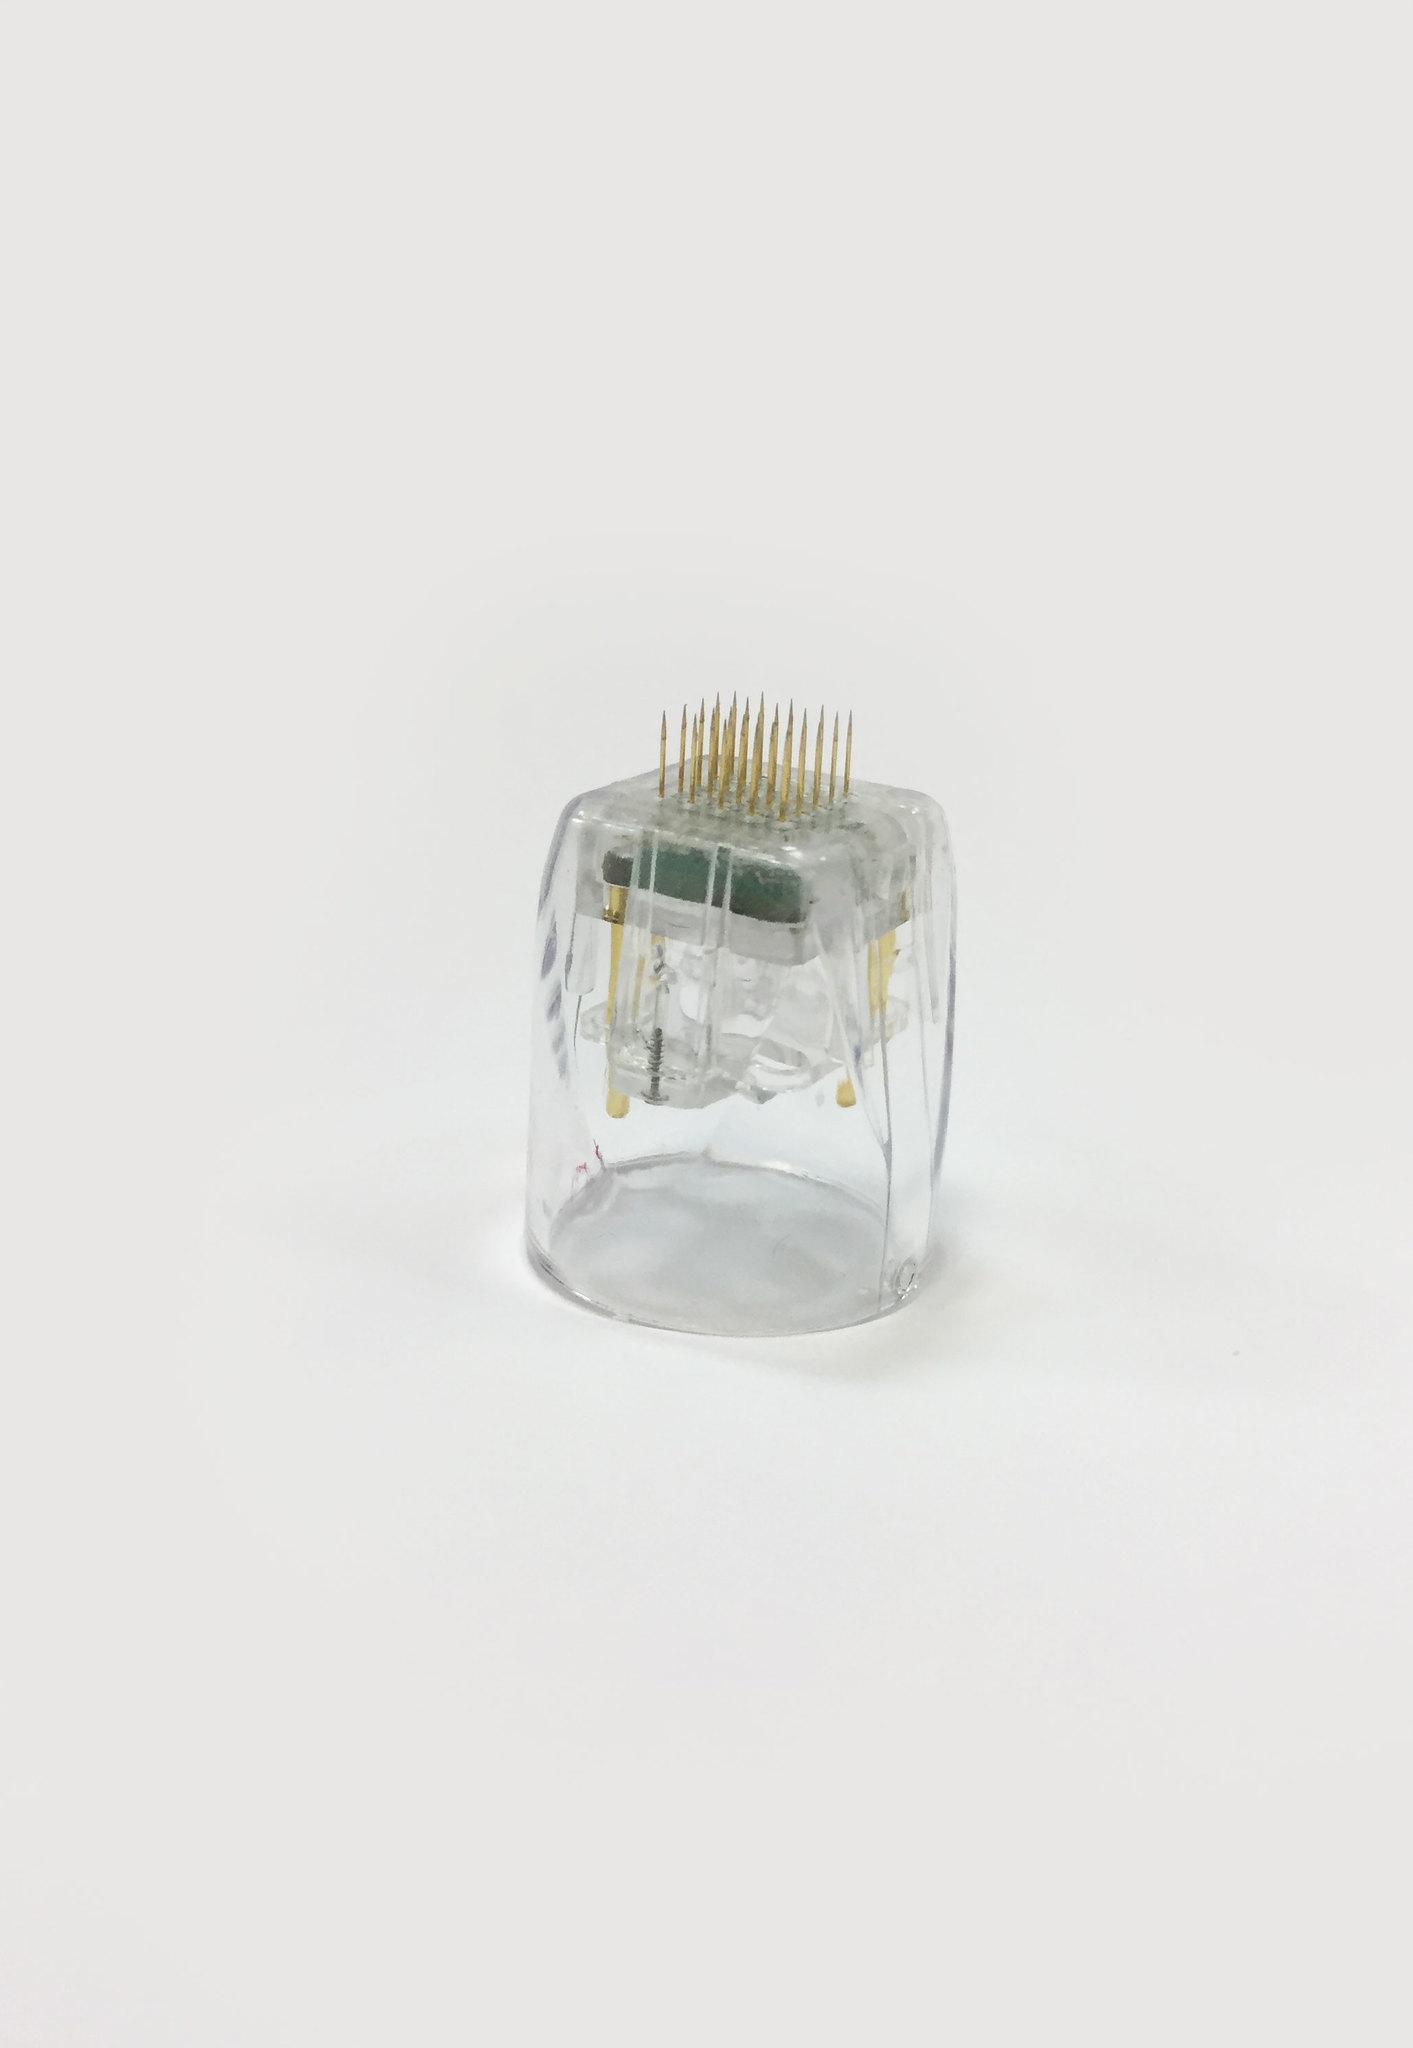 SCARLET S ConsumableTip - Насадки с микроиглами S